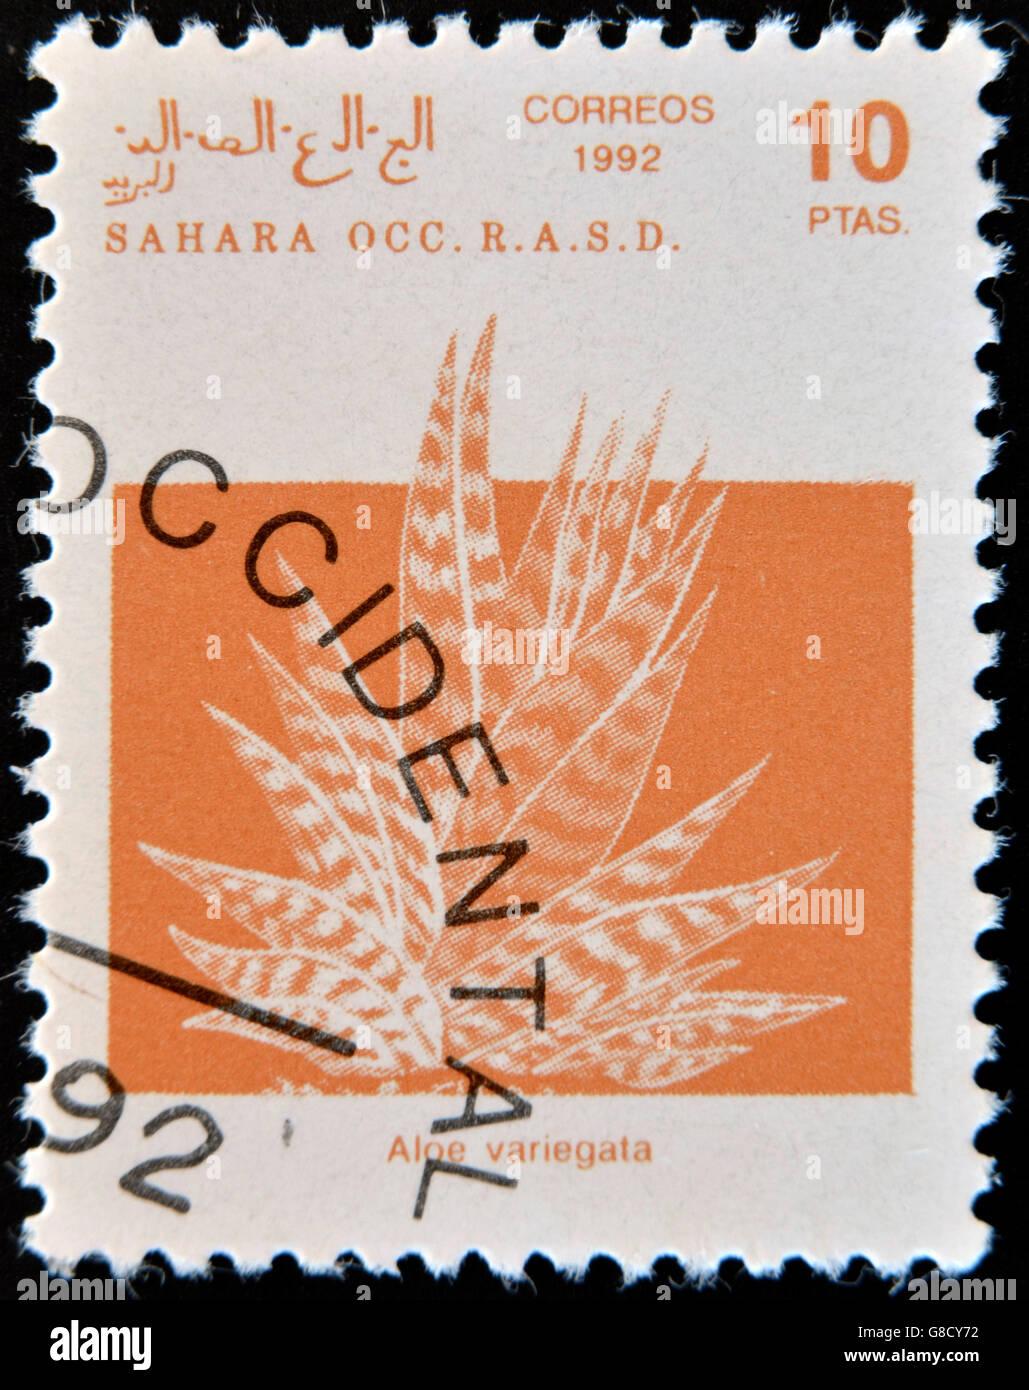 SAHARA - CIRCA 1992: A stamp printed in Sahrawi Arab Democratic Republic (SADR), depicted Aloe variegata, circa - Stock Image